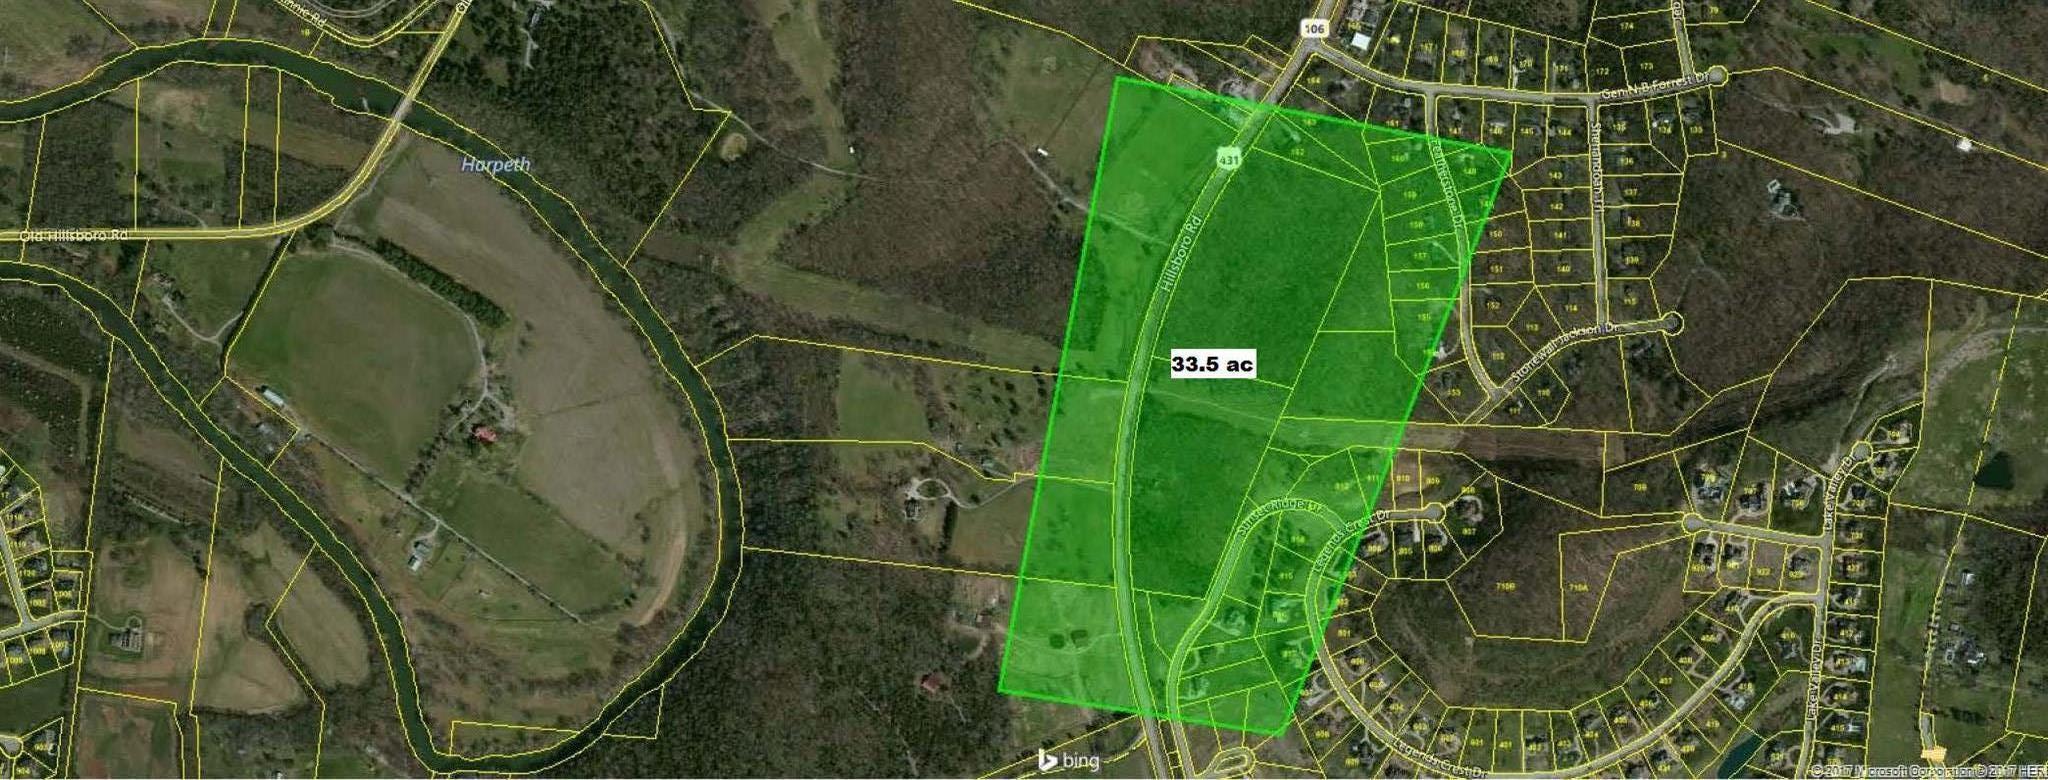 2057 Hillsboro Rd Property Photo - Franklin, TN real estate listing